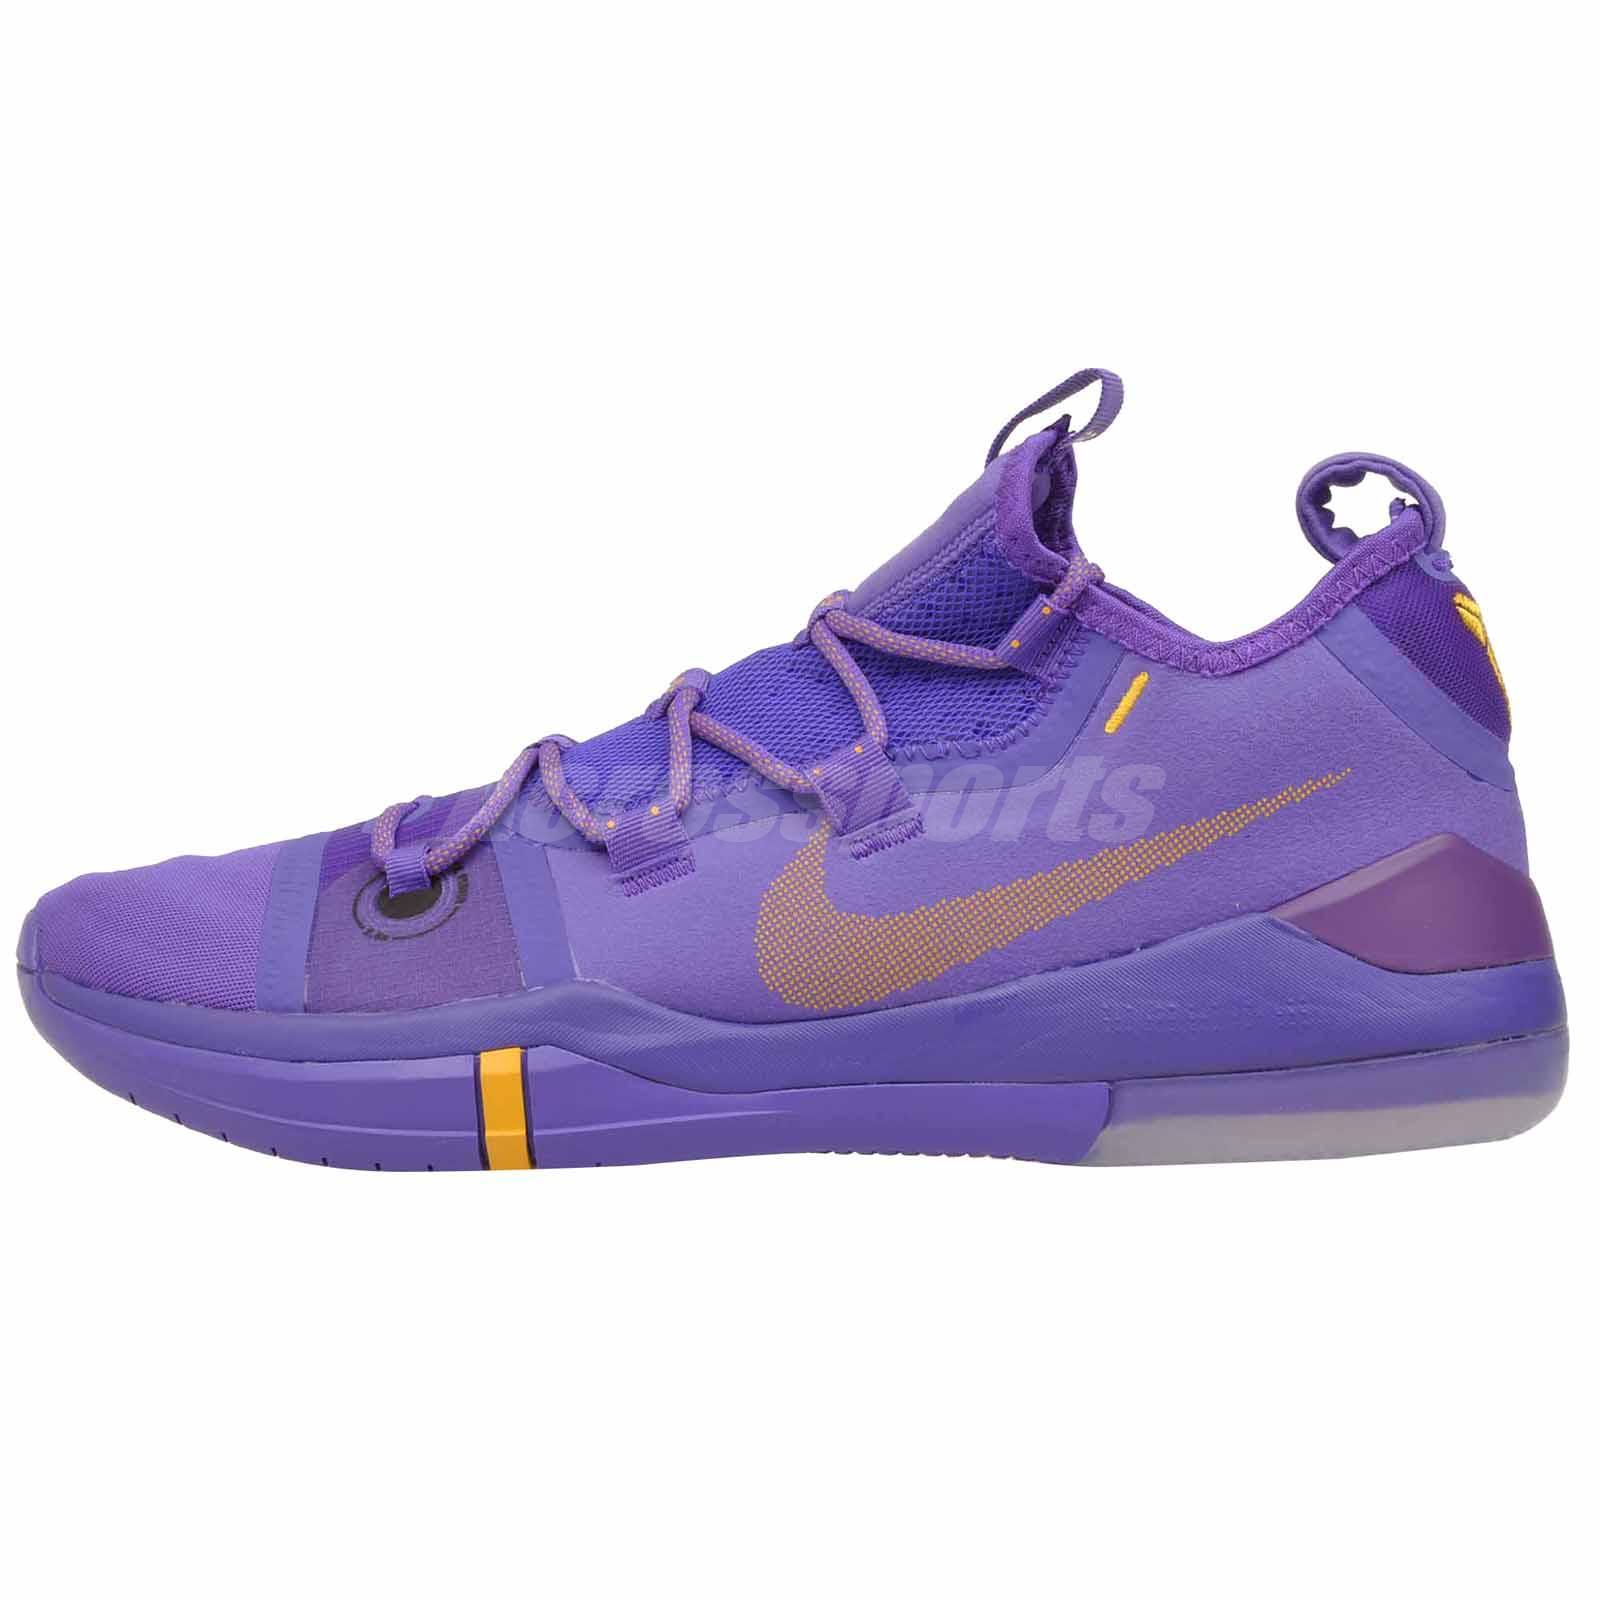 pretty nice 92821 d0147 Nike Kobe AD Basketball Mens Shoes Hyper Grape NWOB AR5515-500